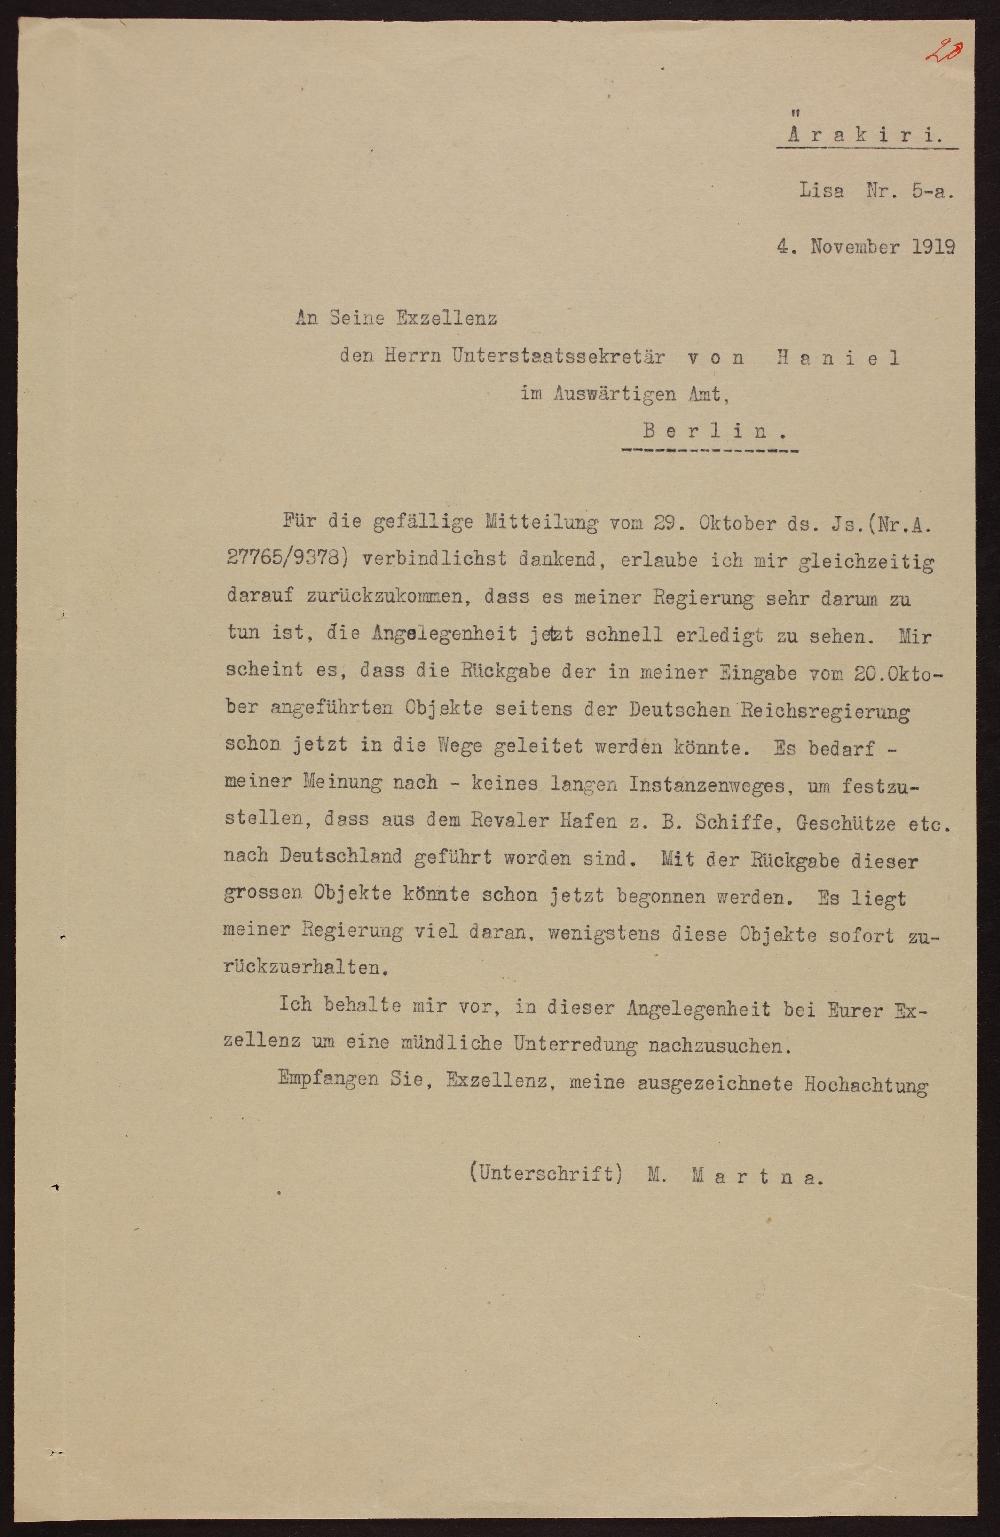 M.Martna kirja ärakiri riigisekretär von Haniel'le 4. nov. 1919. era0957_011_0000359_00001_t